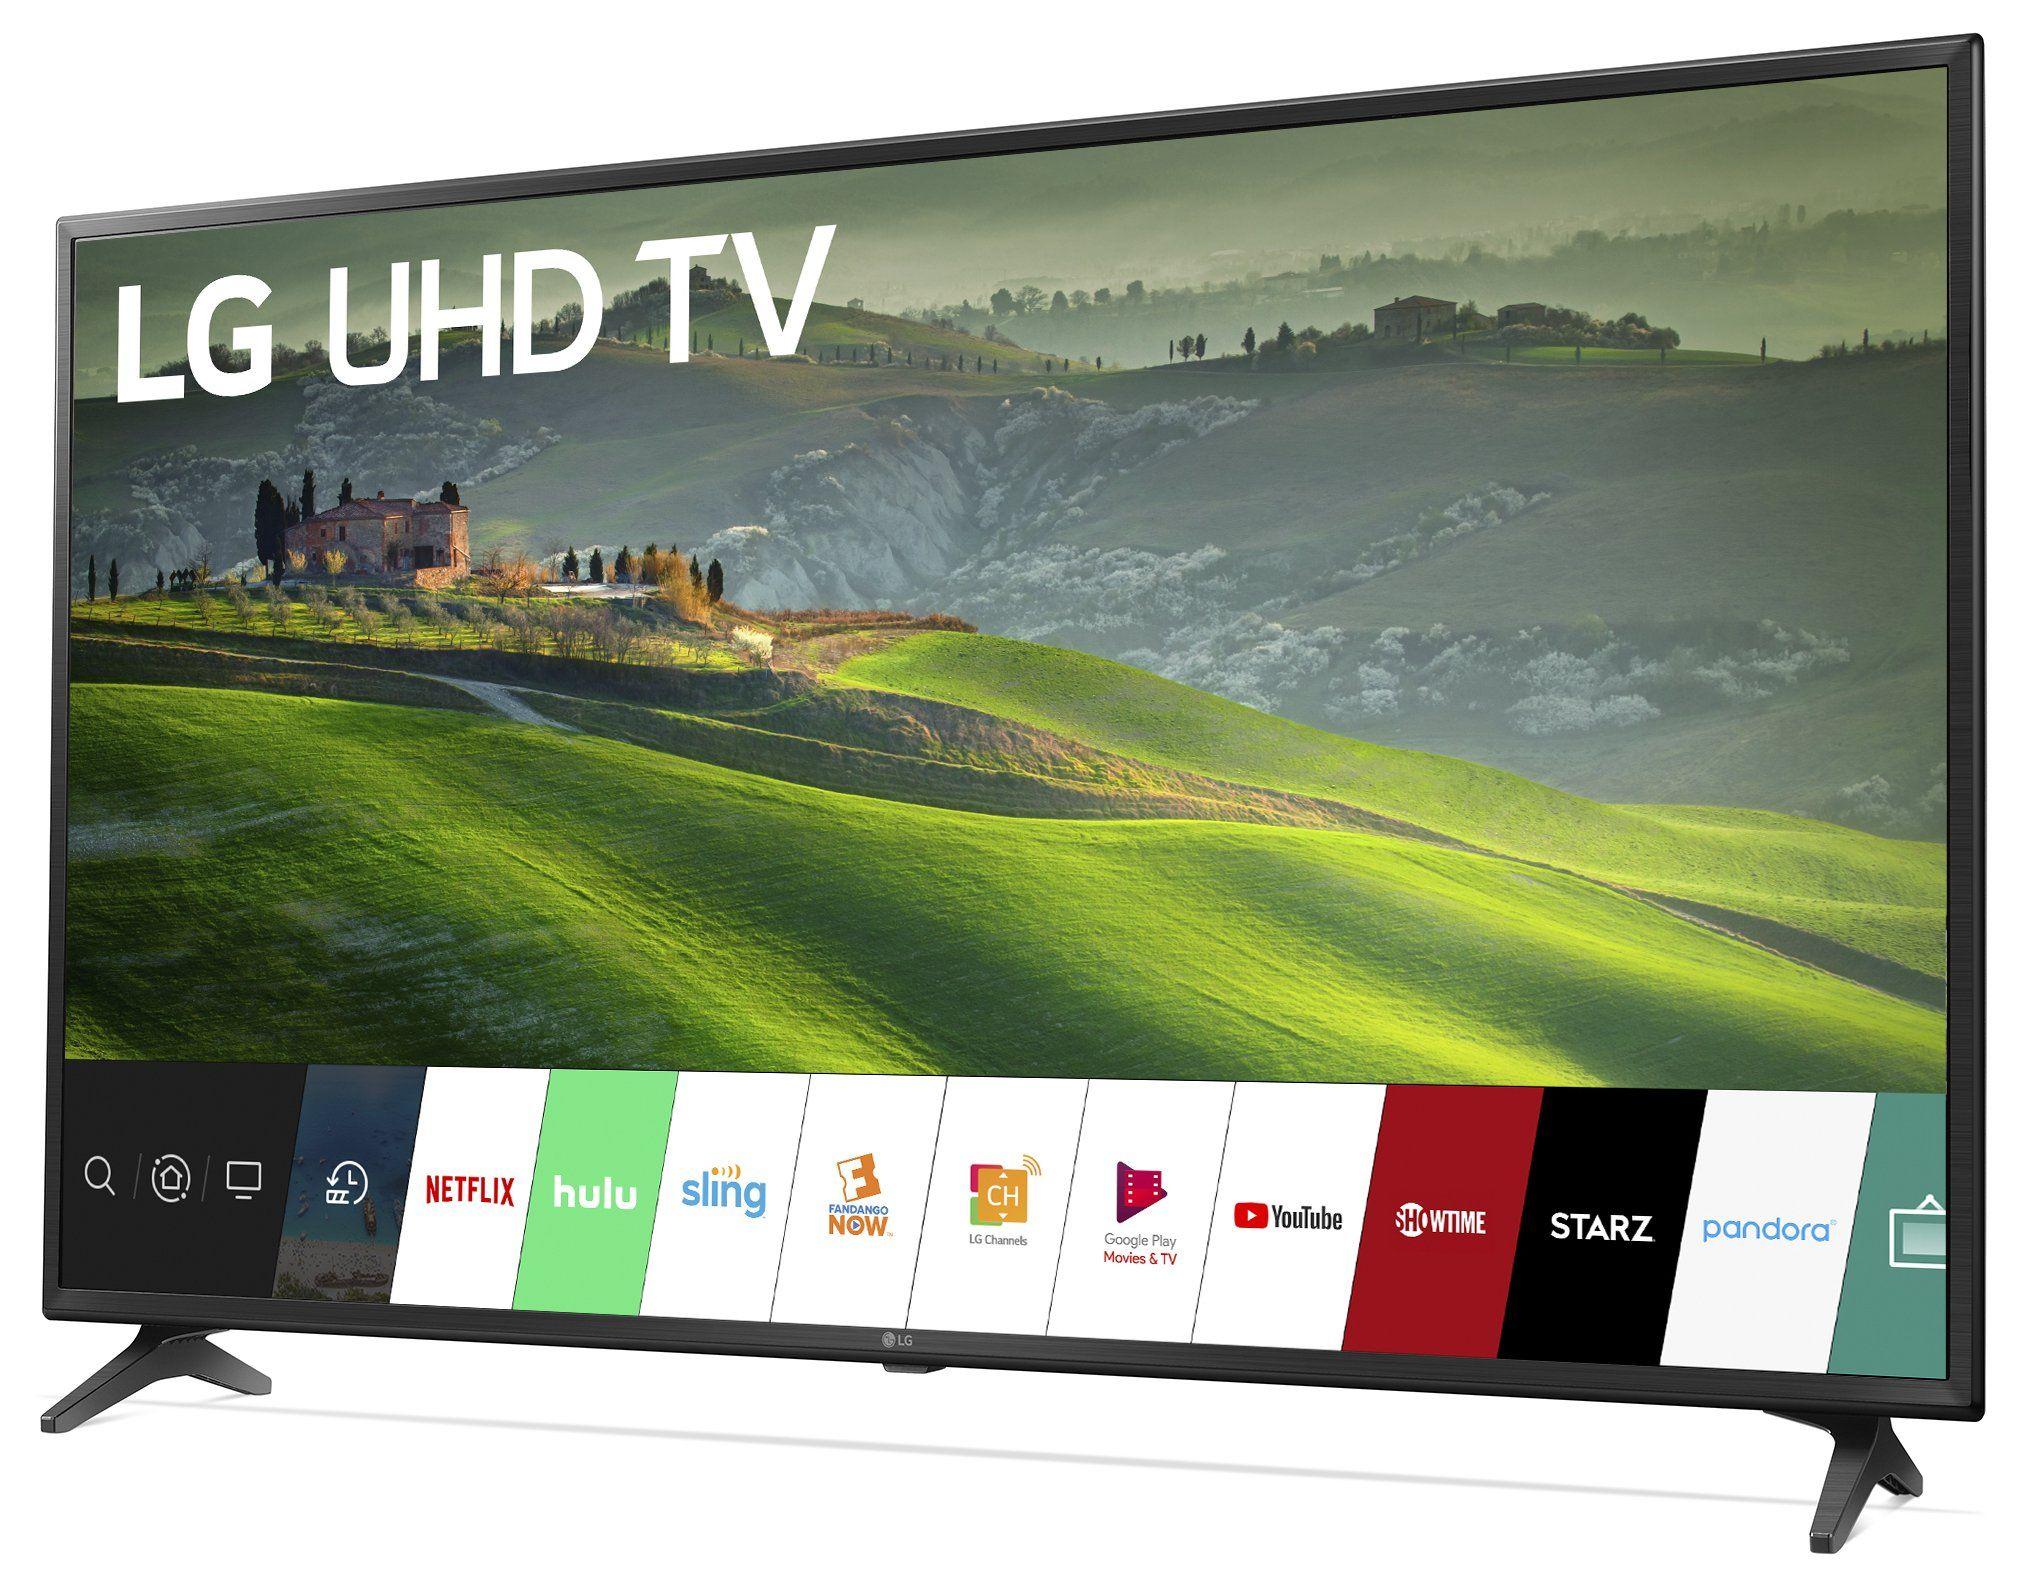 Lg Um6900 55 Inch Led 4k Uhd Smart Tv Smart Tv Cool Things To